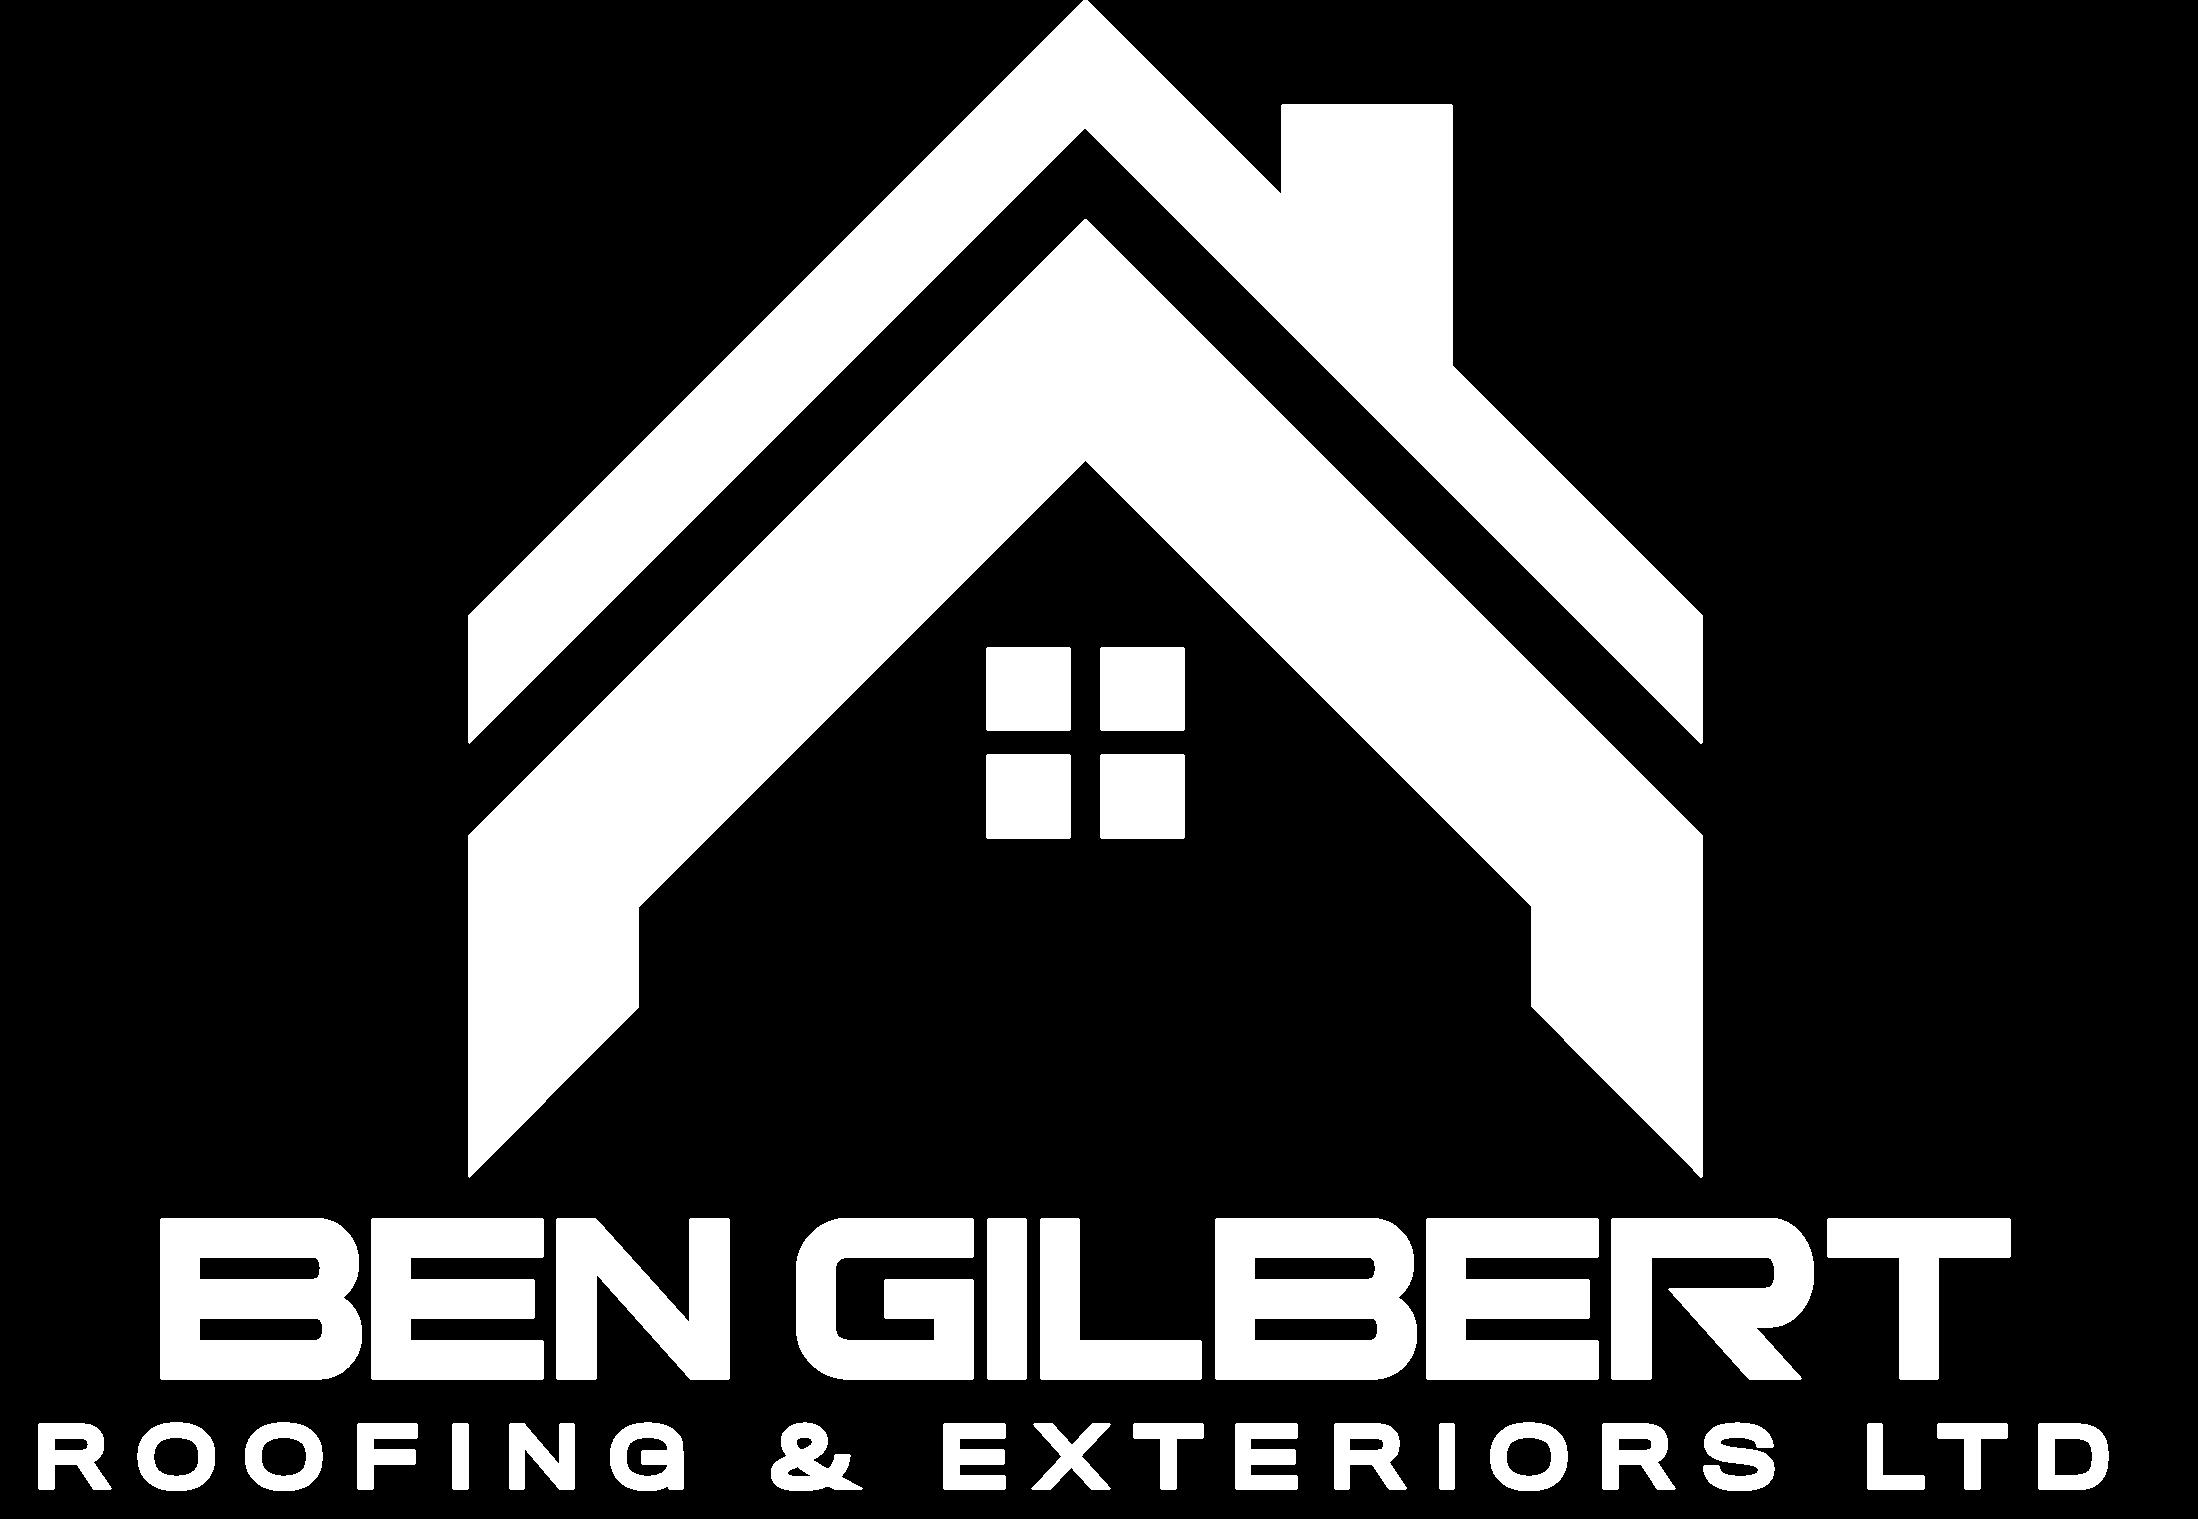 Ben Gilbert Roofing